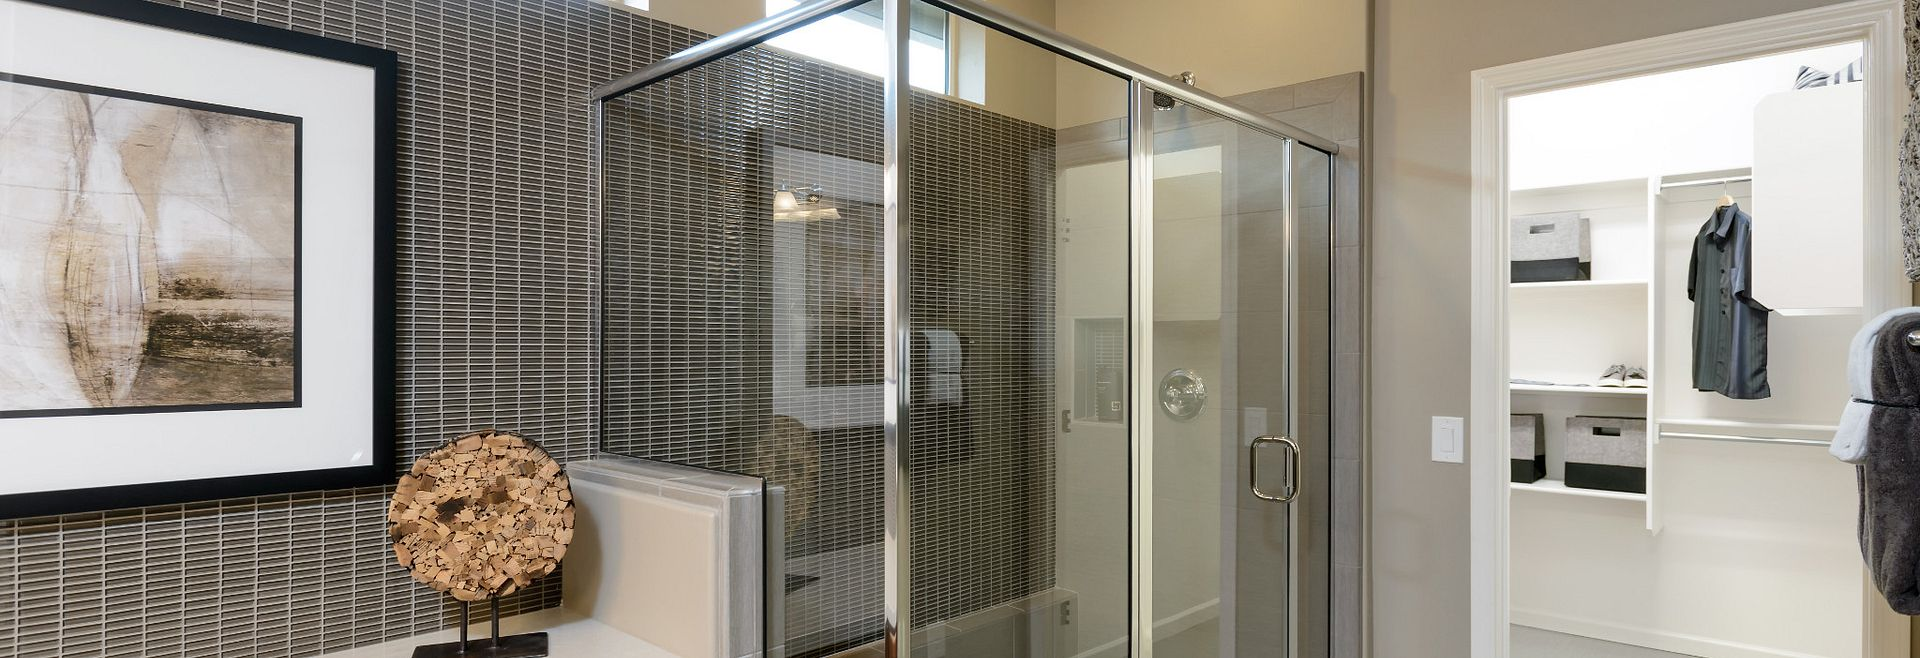 Optic Model Master Bathroom